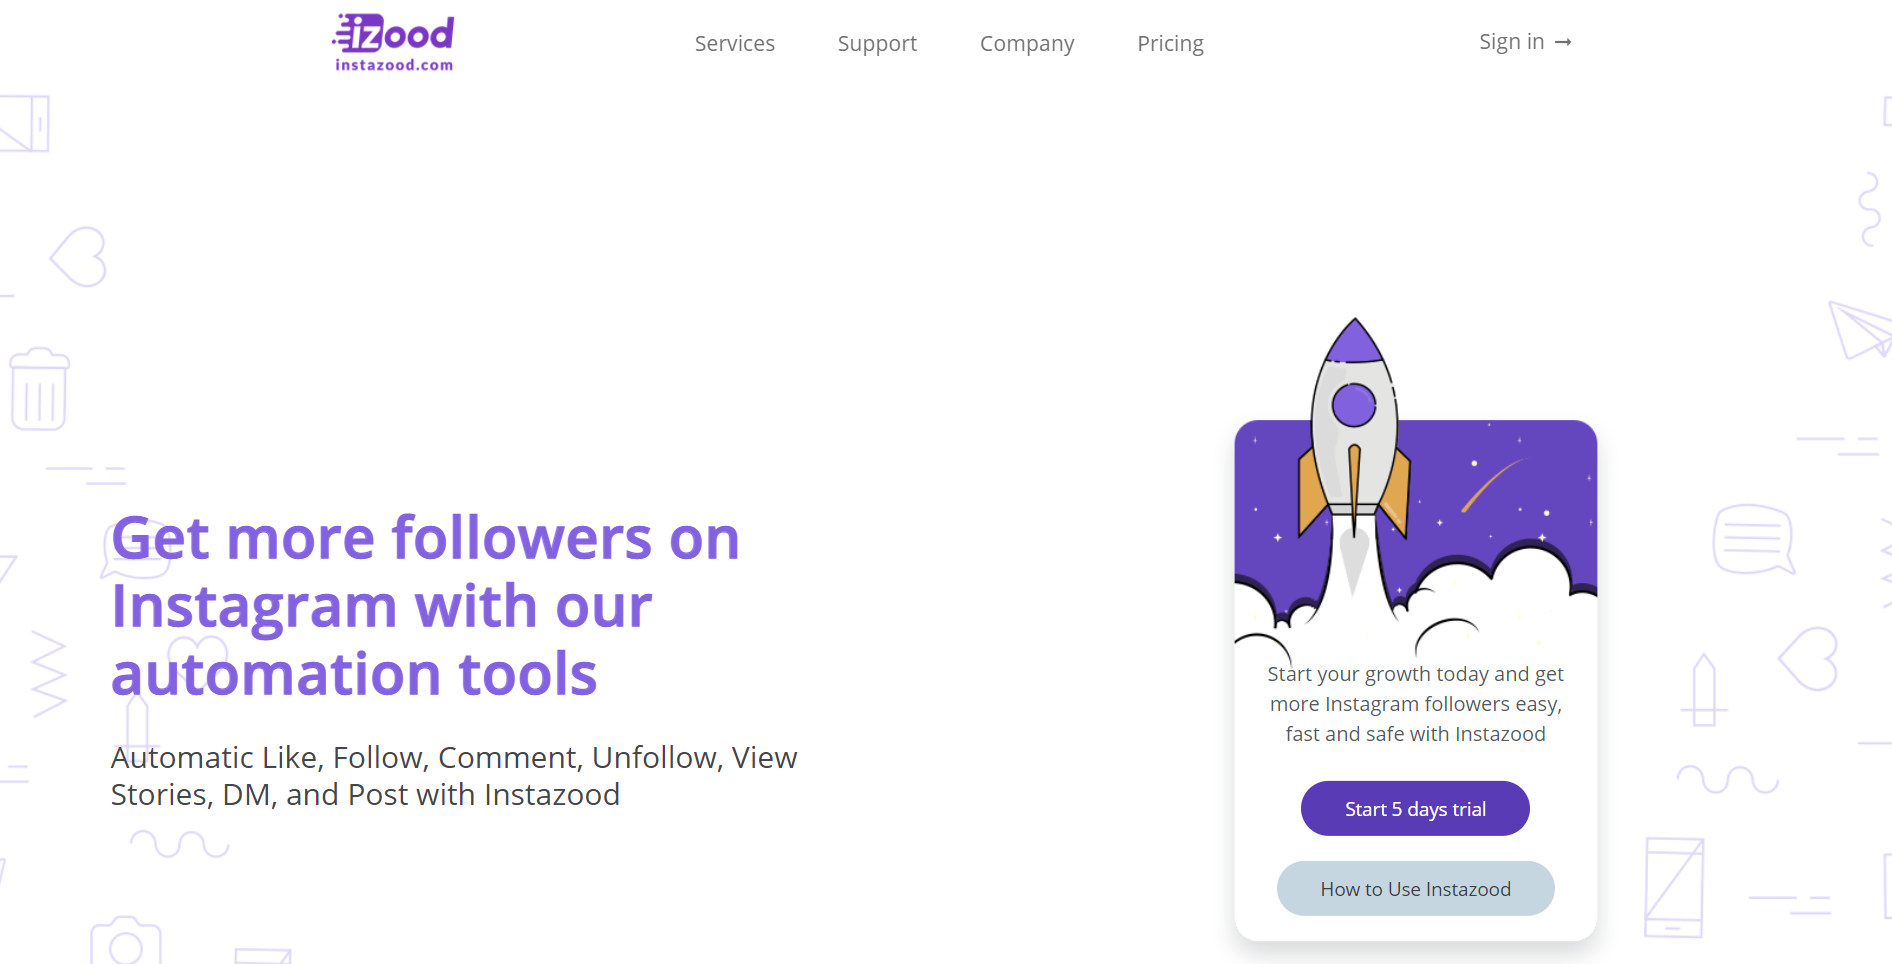 Instazood homepage